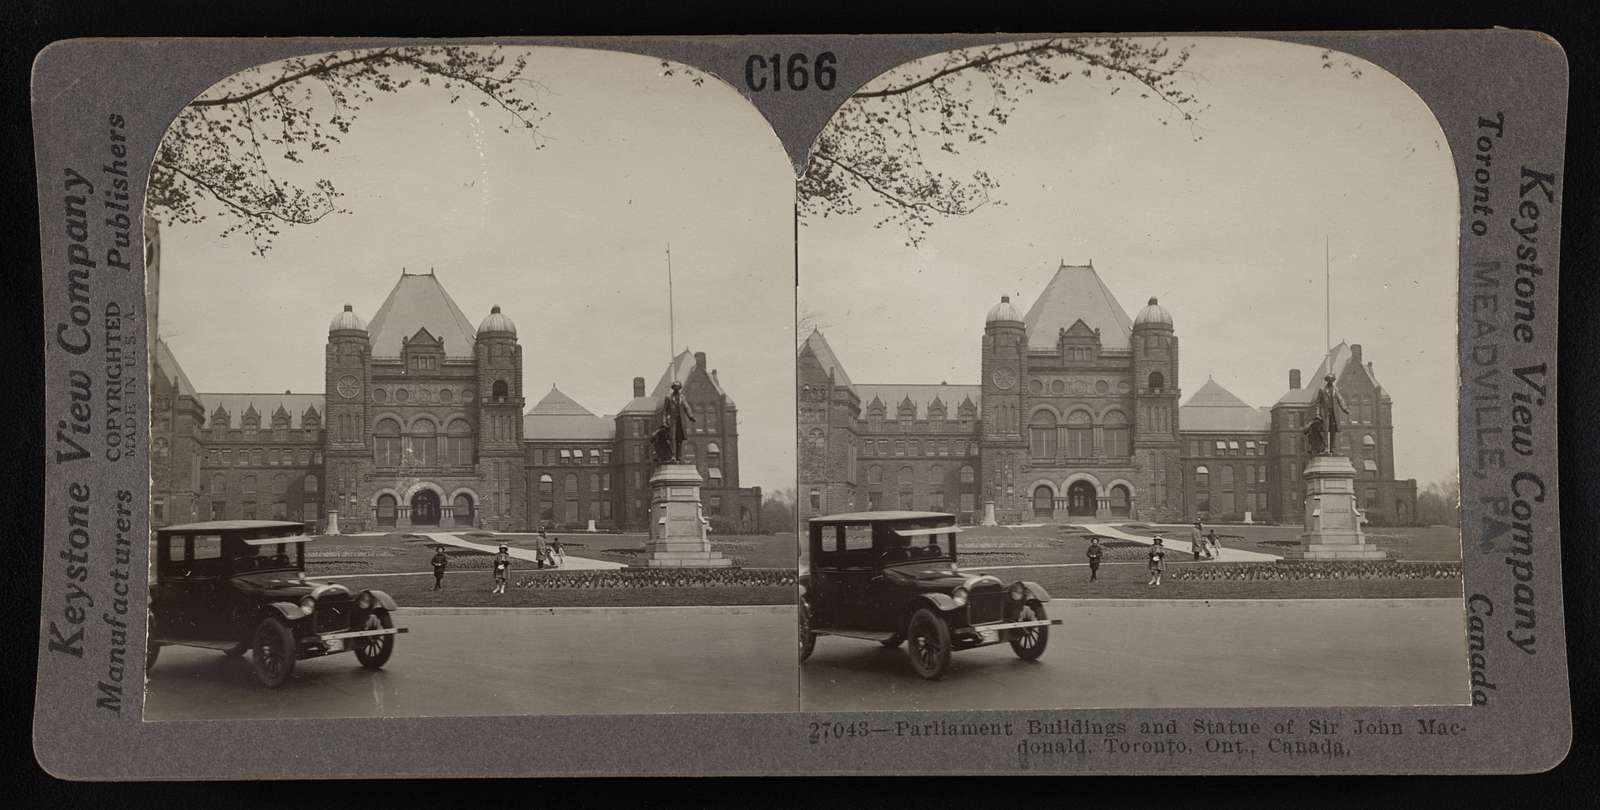 Parliament buildings and statue of Sir John Macdonald, Toronto, Ont., Canada